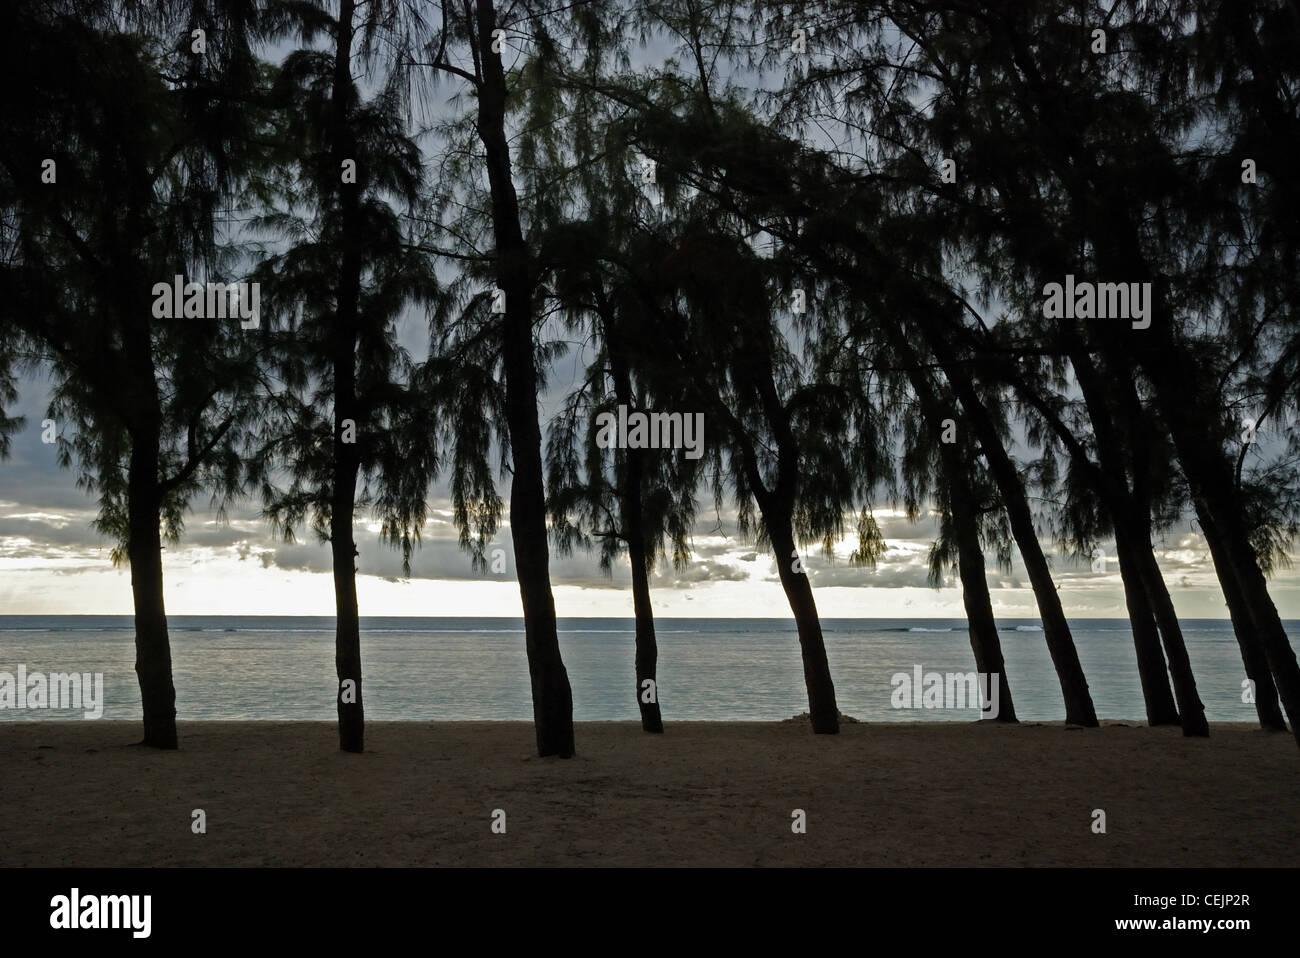 Flic En Flac beach with casuarina trees. Mauritius. - Stock Image